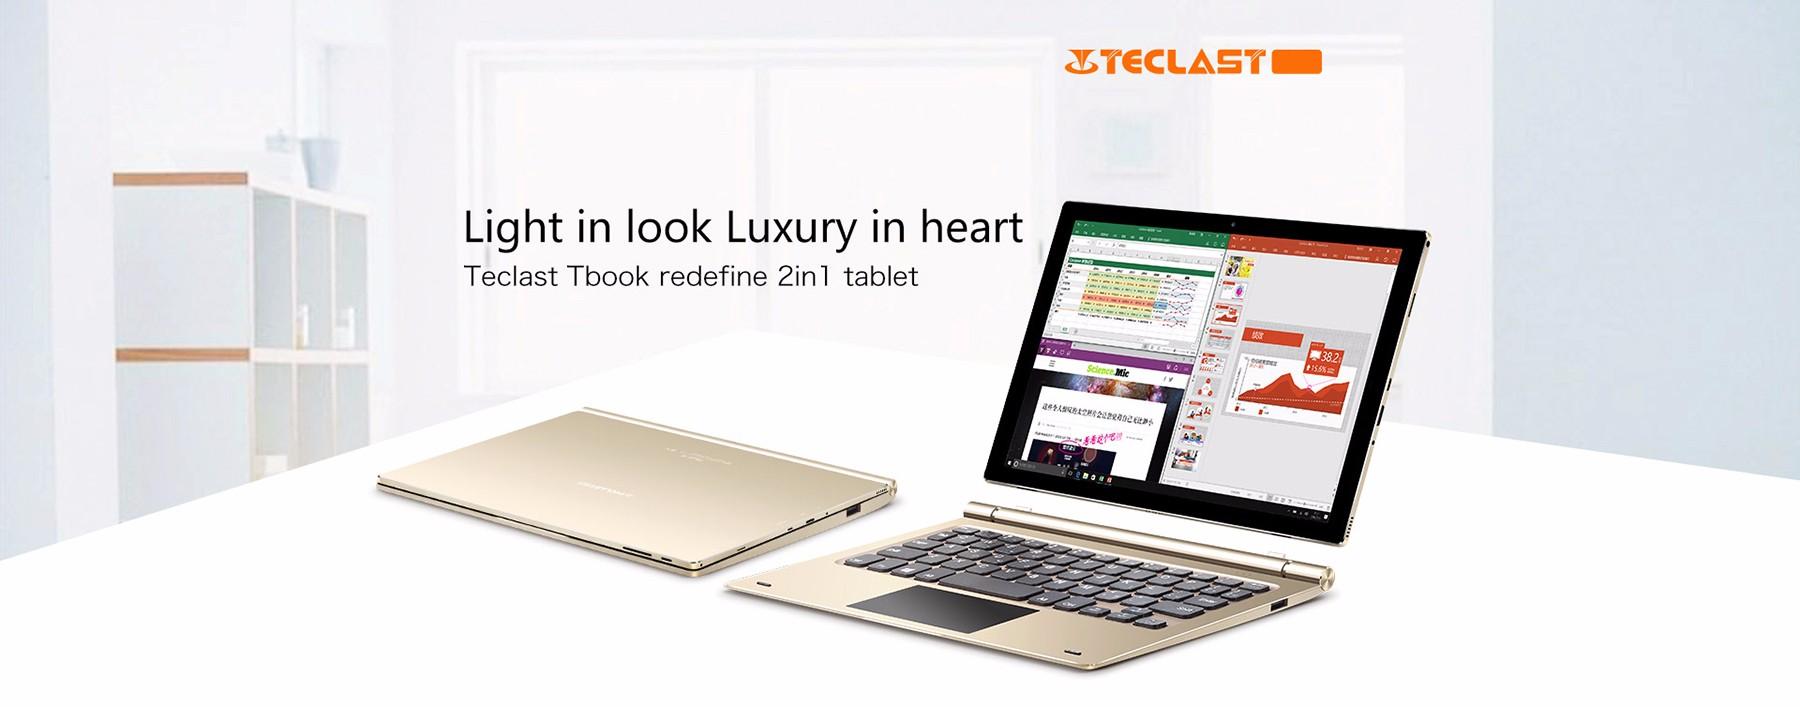 Teclast Tbook 10 y Teclast Tbook 10 S